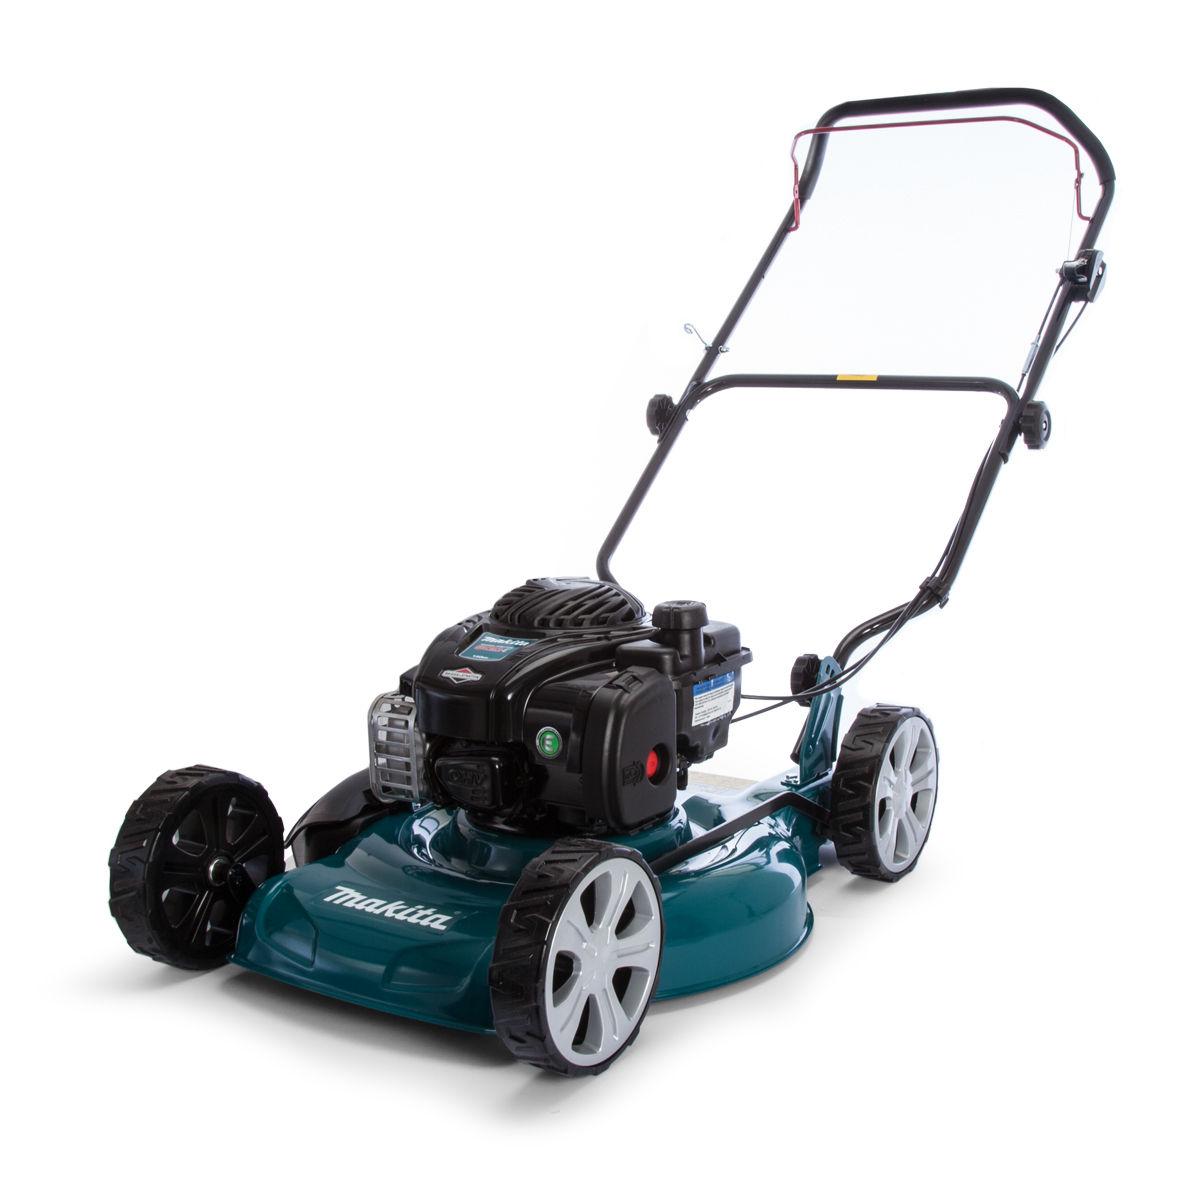 Makita PLM4817 140CC 4 Stroke 48cm Mulching Lawnmower